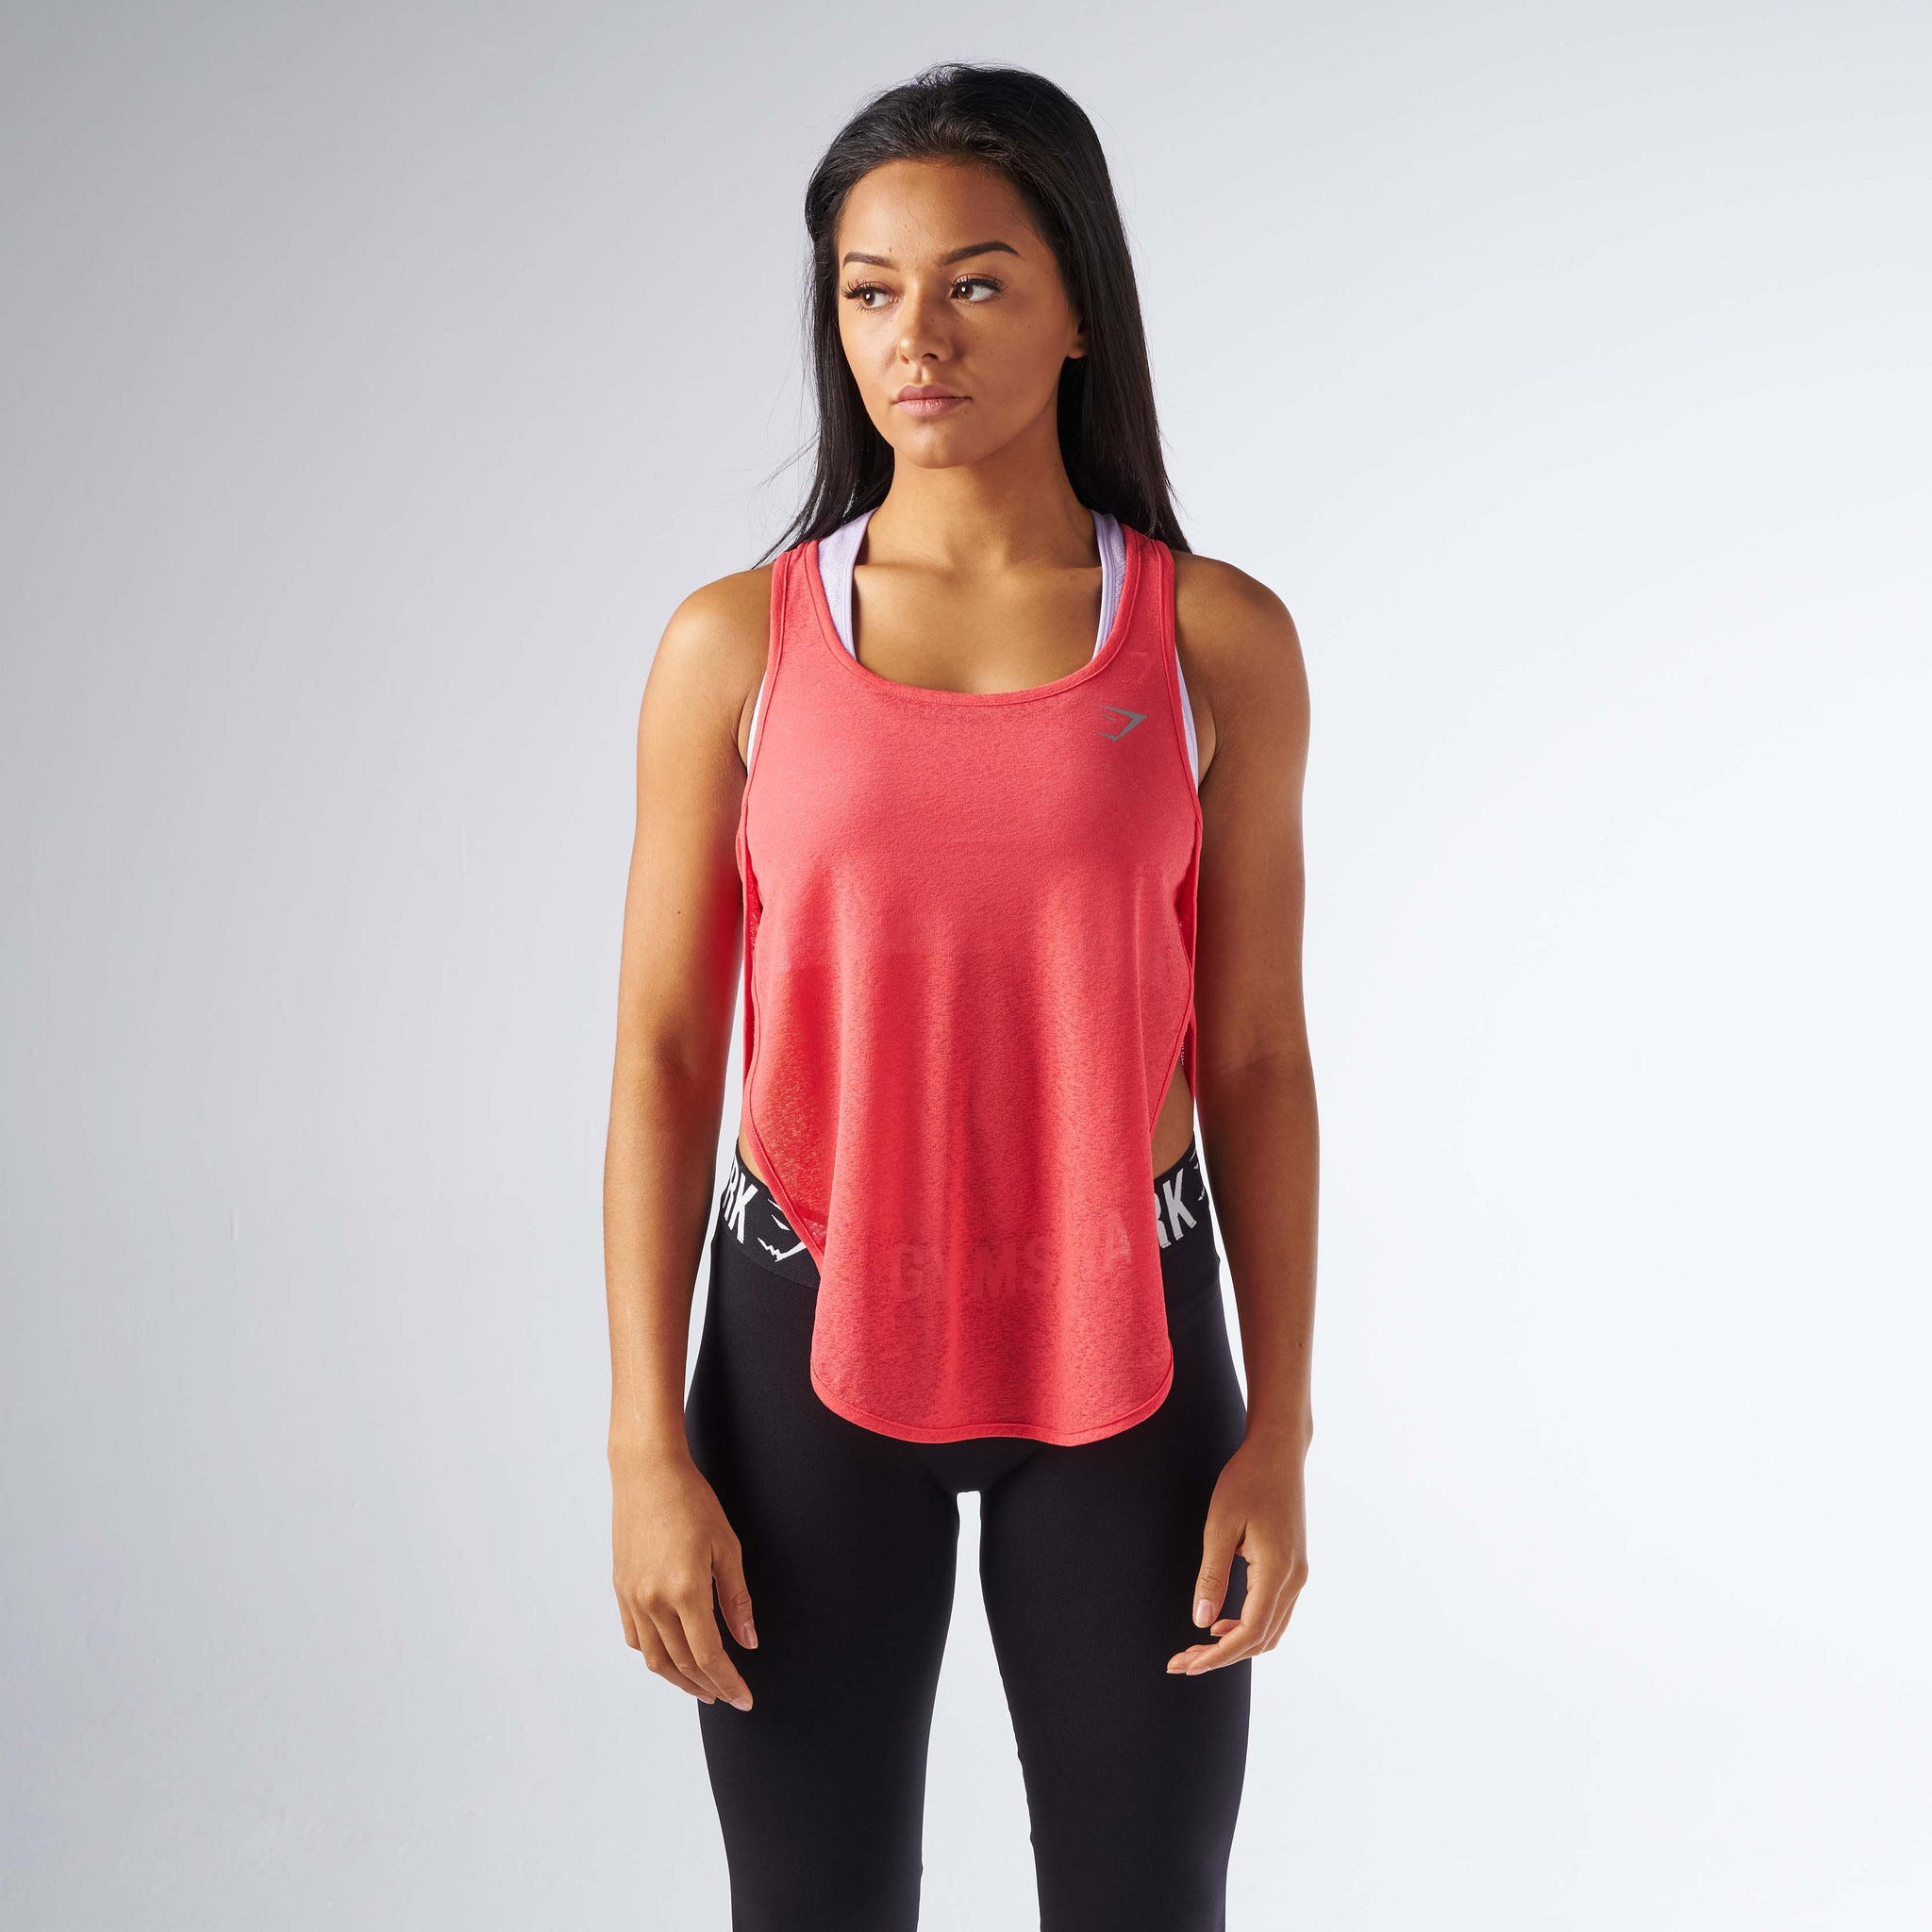 115f194c0651c Gymshark Workout Clothes Best Selling Leggings US Shops